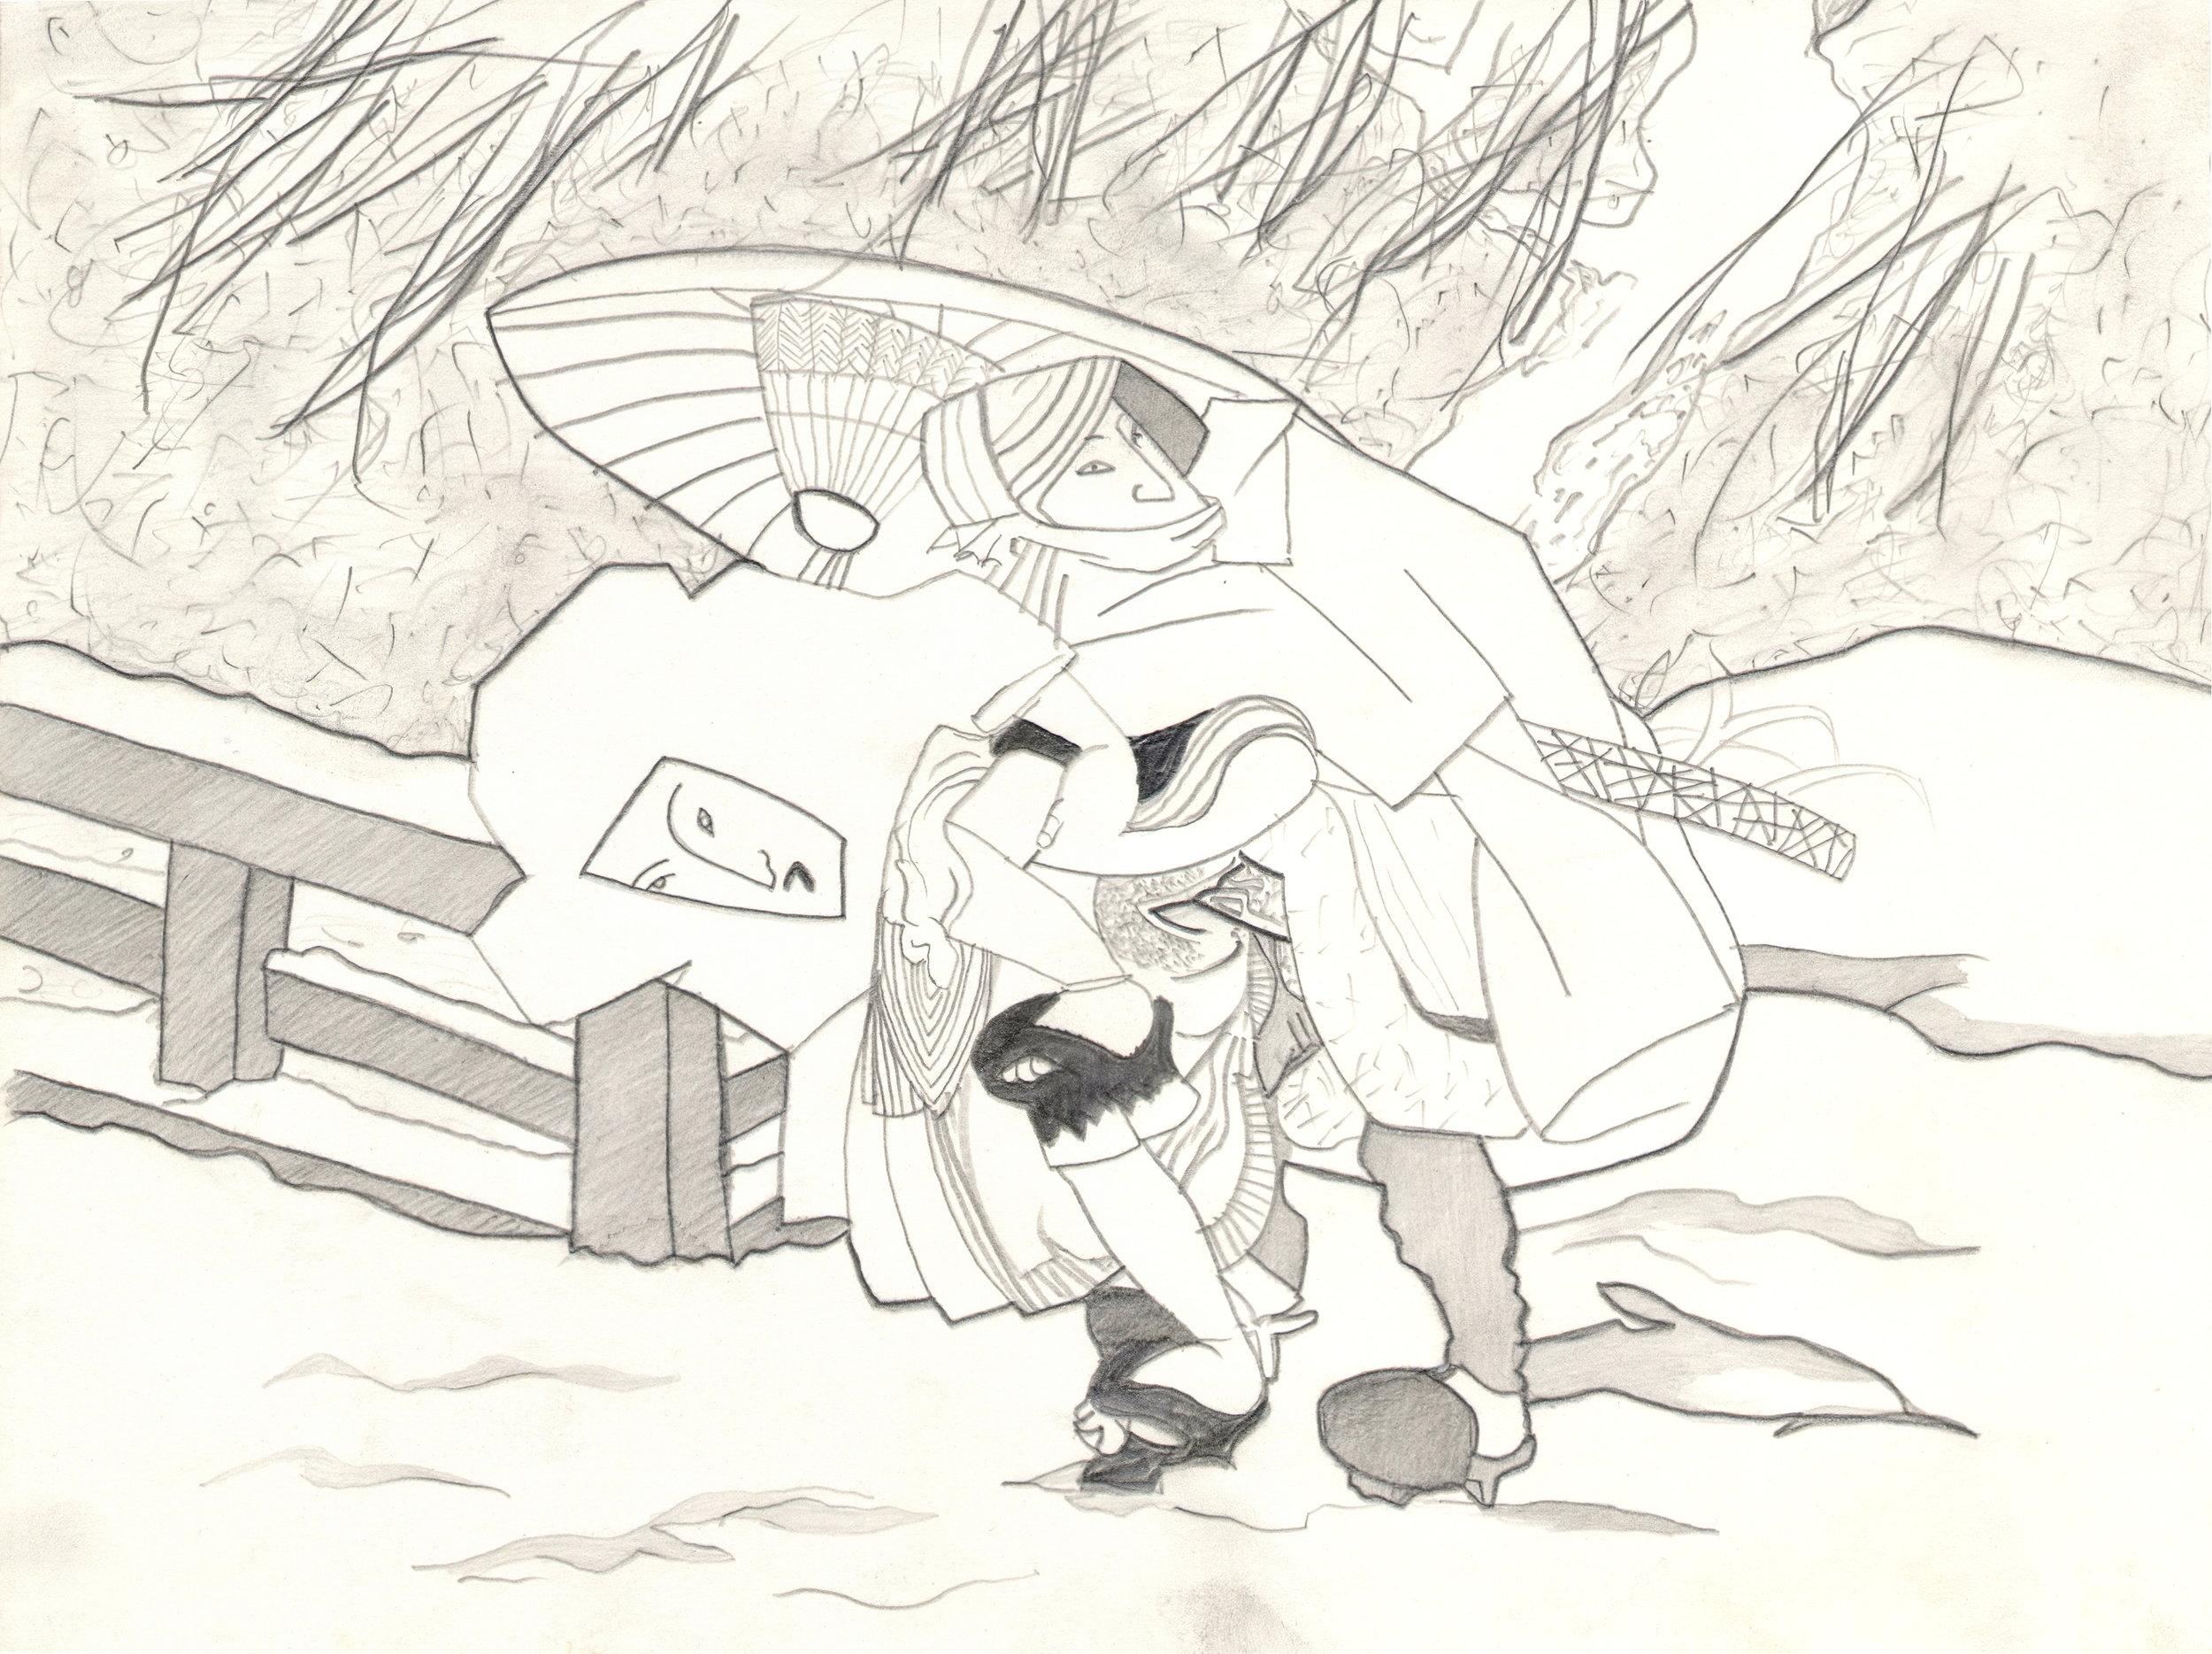 O.T. ( Serie Shunga IV ), 2015  26x35.5cm, Bleistift auf Papier